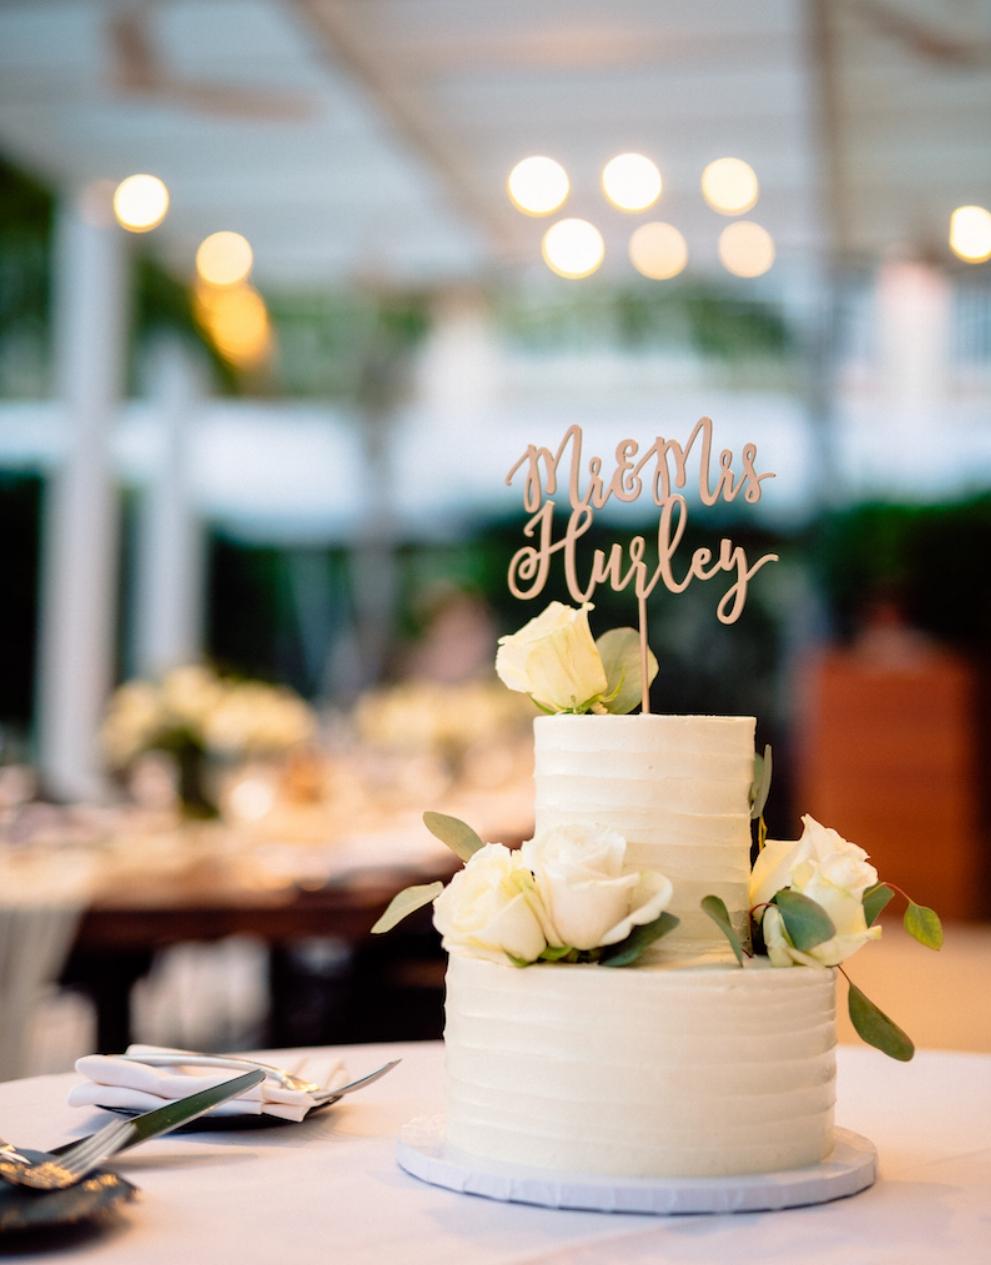 Marco Island Beach Wedding Reception JW Marriott Matt Steeves Sweetified Bakery.jpg